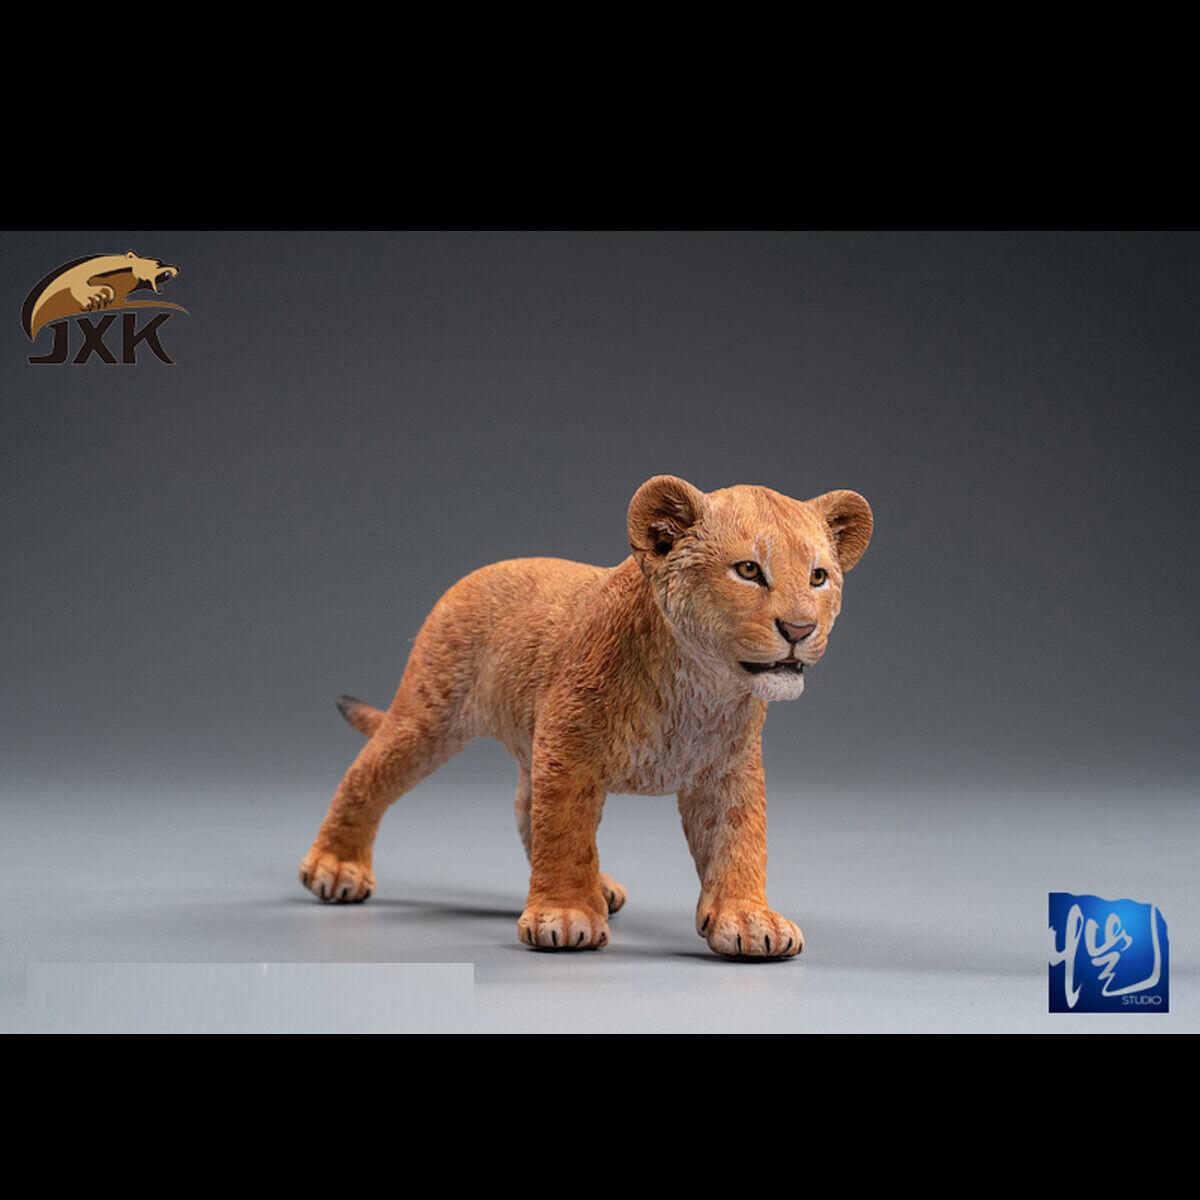 JXK X Studio 1 6 JXK024B Simaba The Lion King Animal Figure Toys Resin Statue